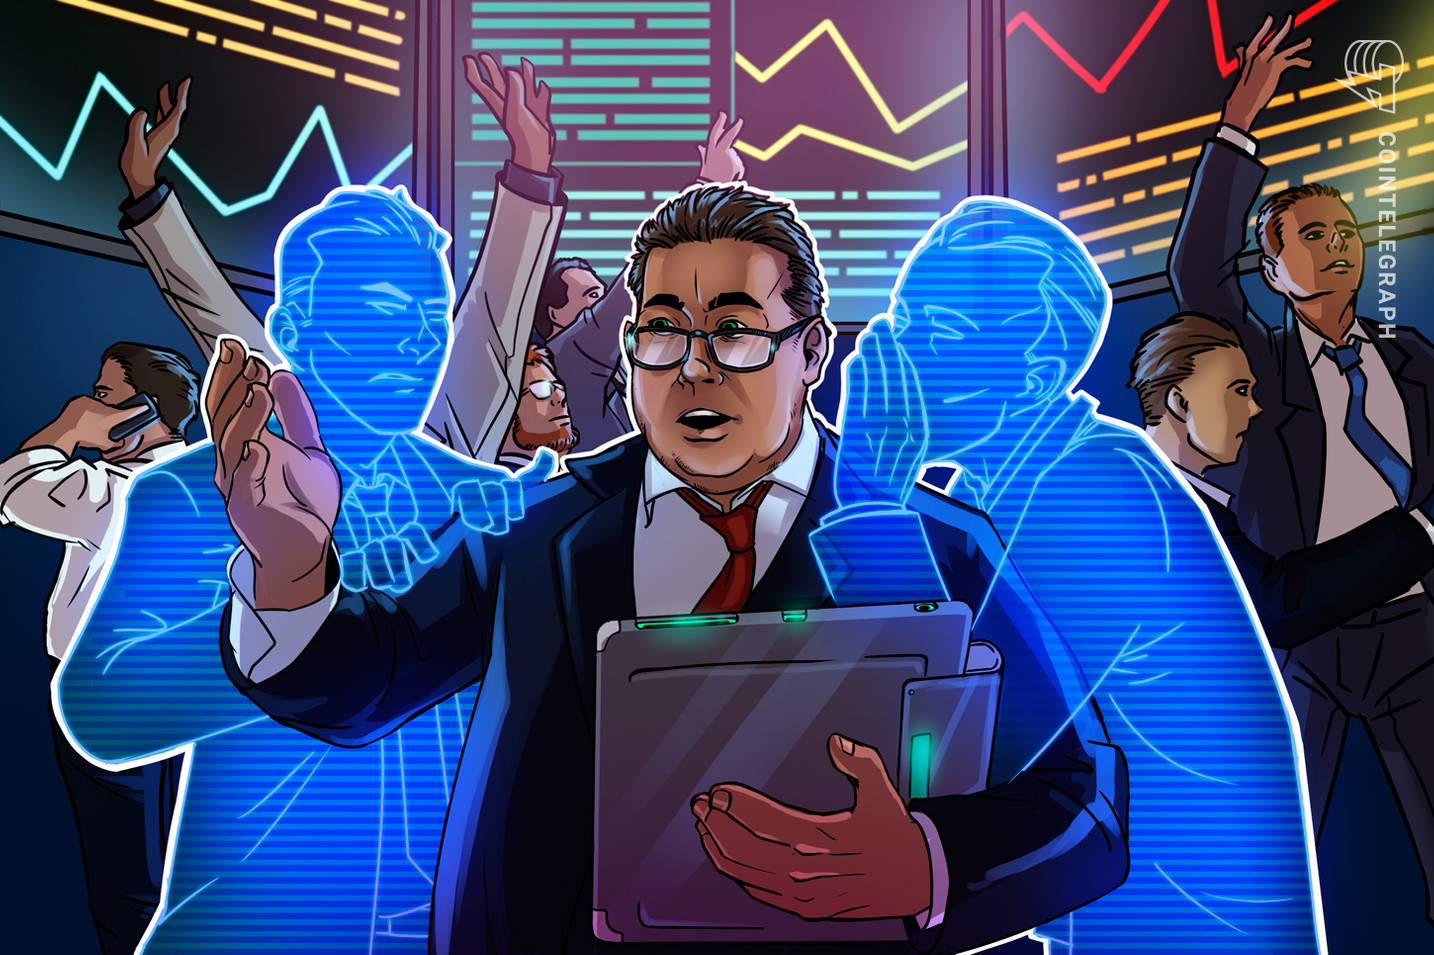 Fundstrat e eToro prevêem que crise do coronavírus pode fortalecer o Bitcoin